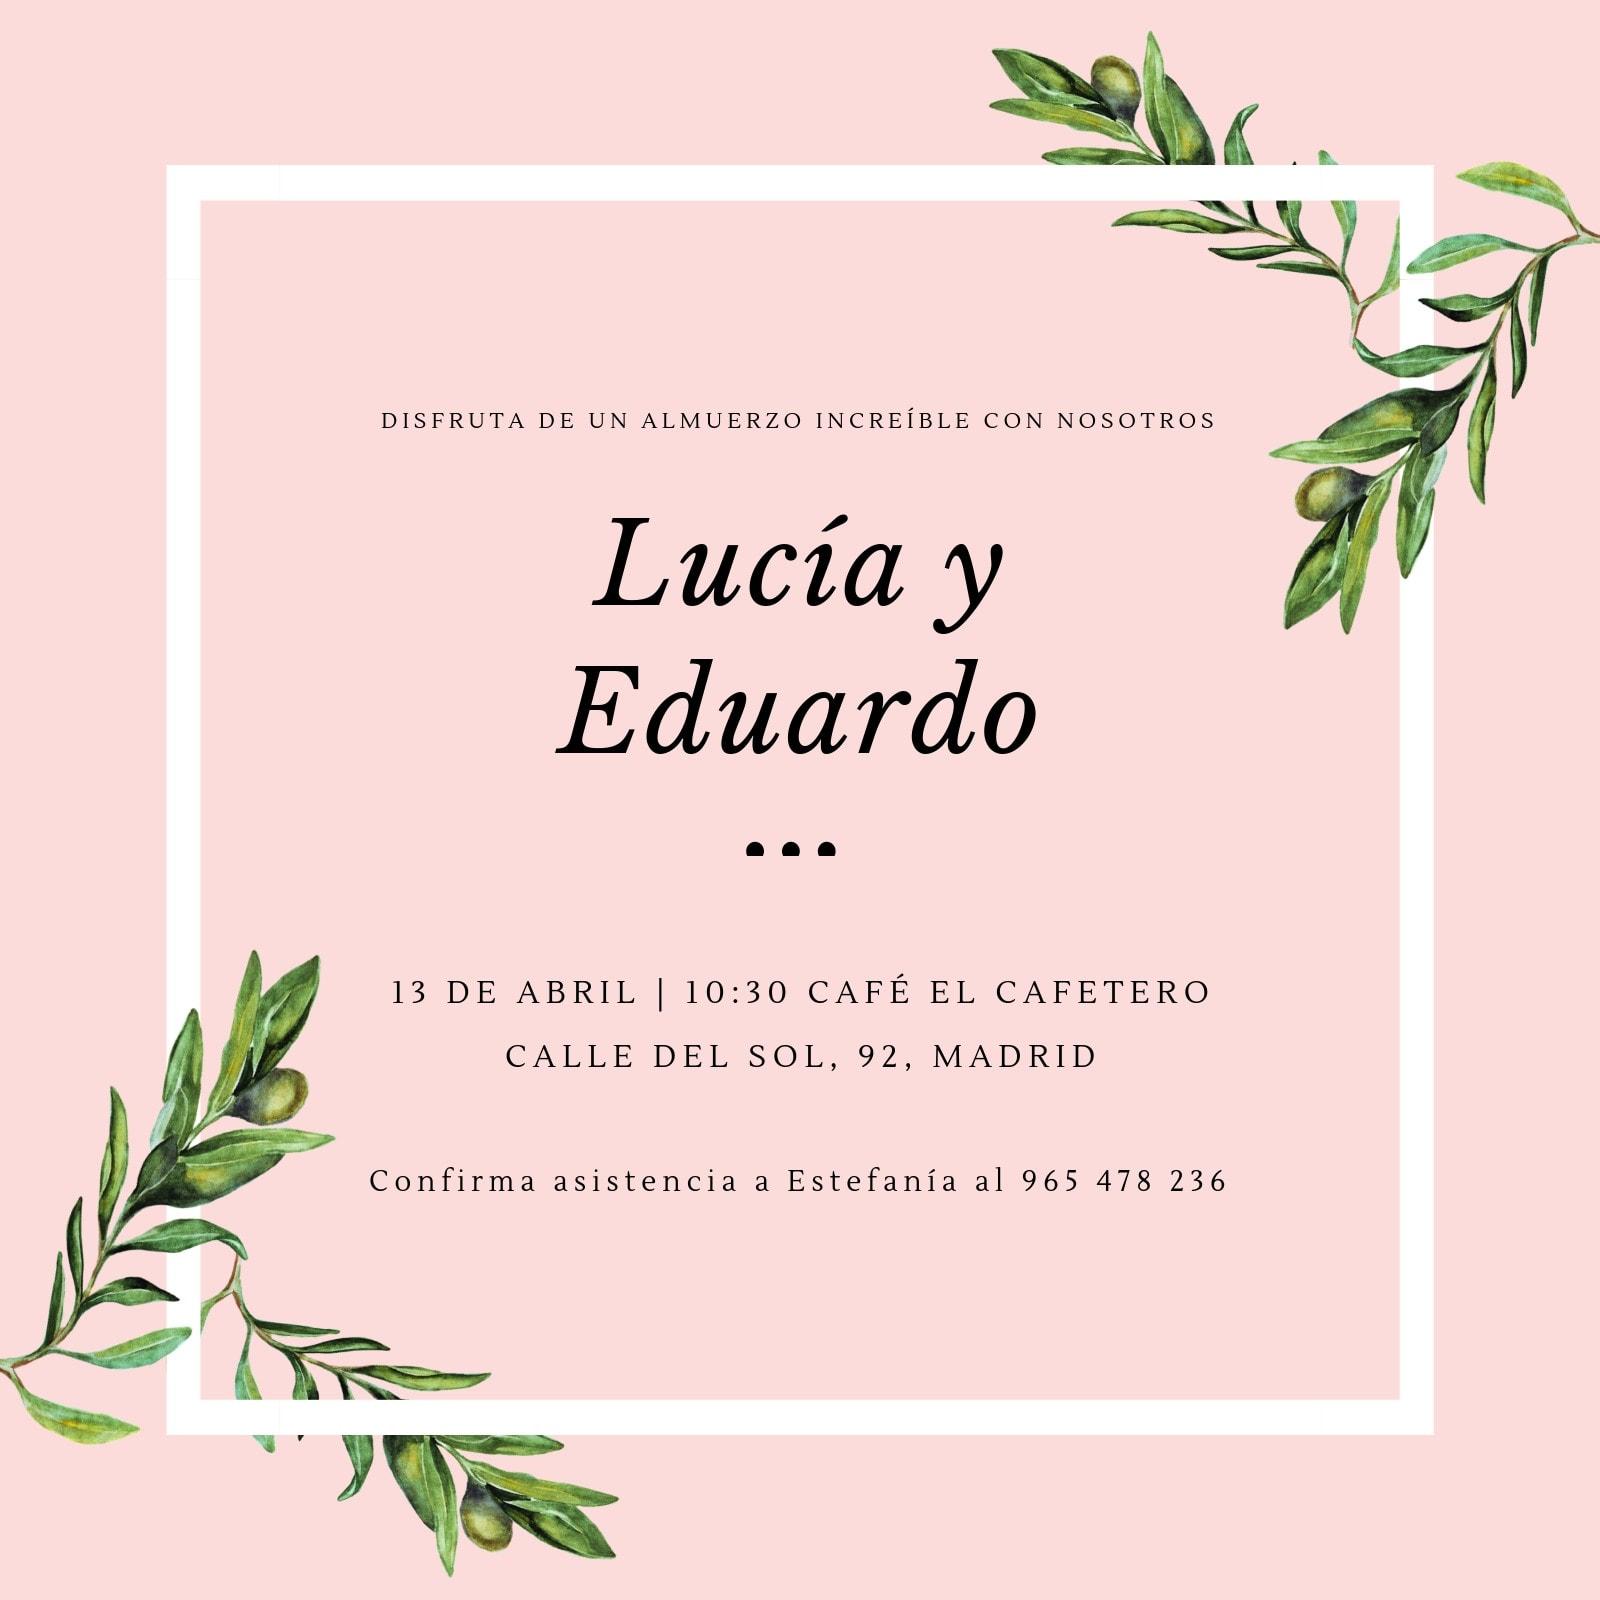 Invitación Boda Almuerzo Rosa Verde Oliva